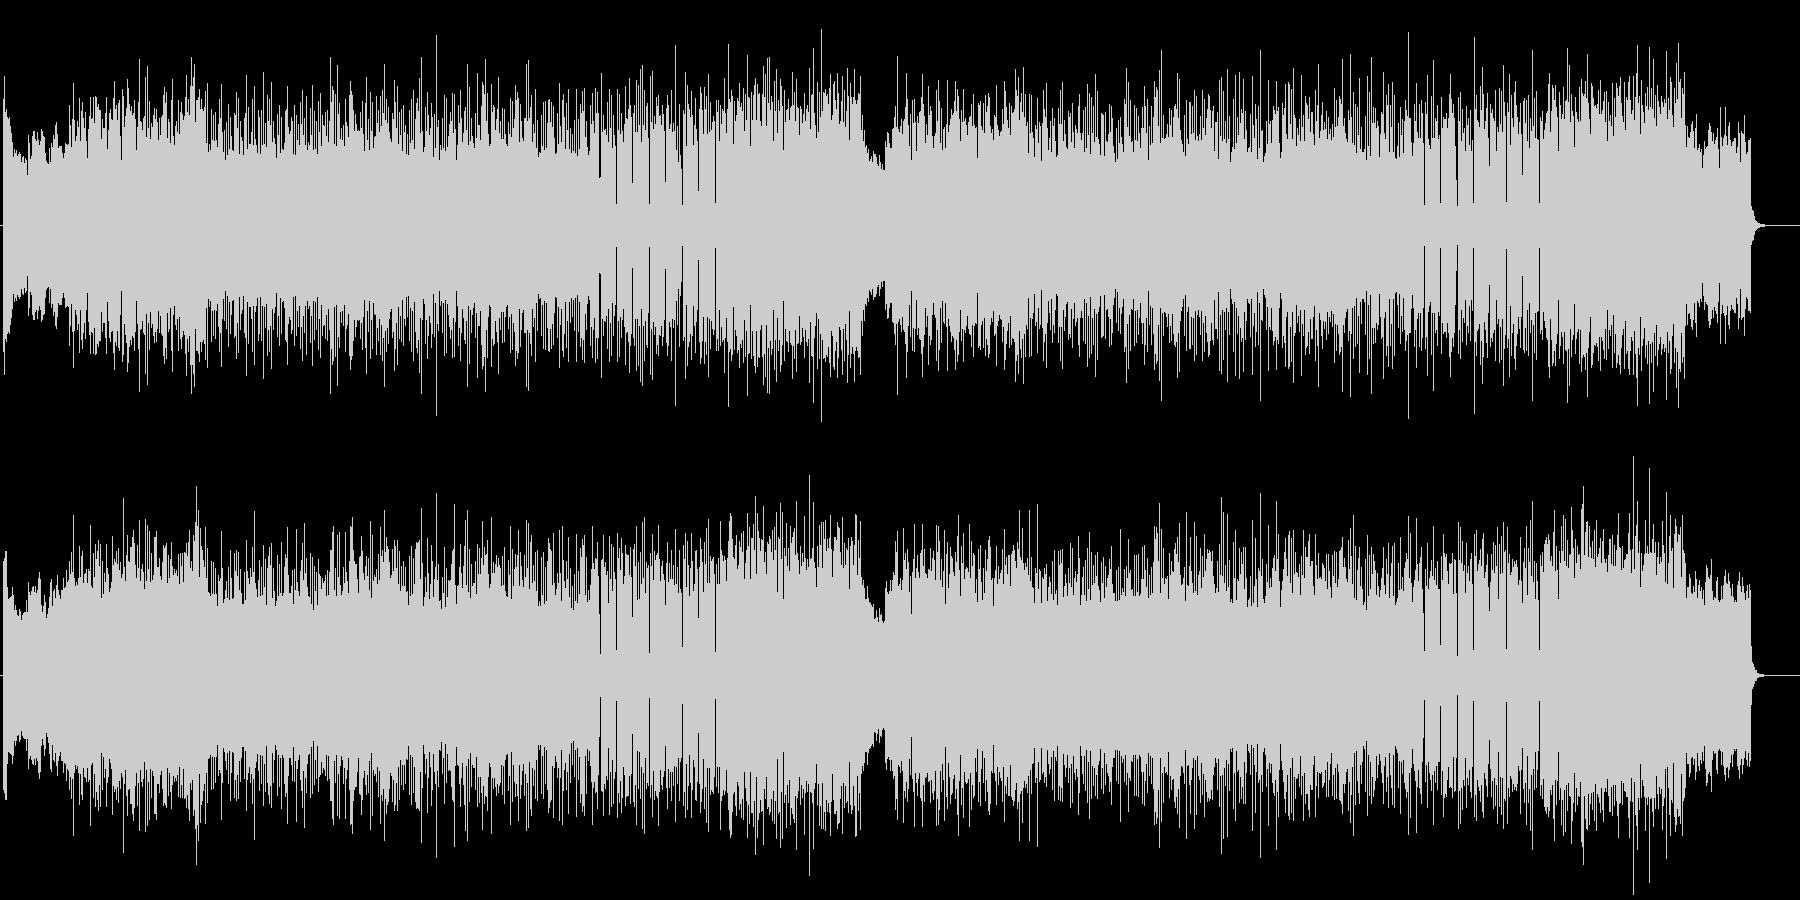 「HR/HM」「DARK」BGM273の未再生の波形